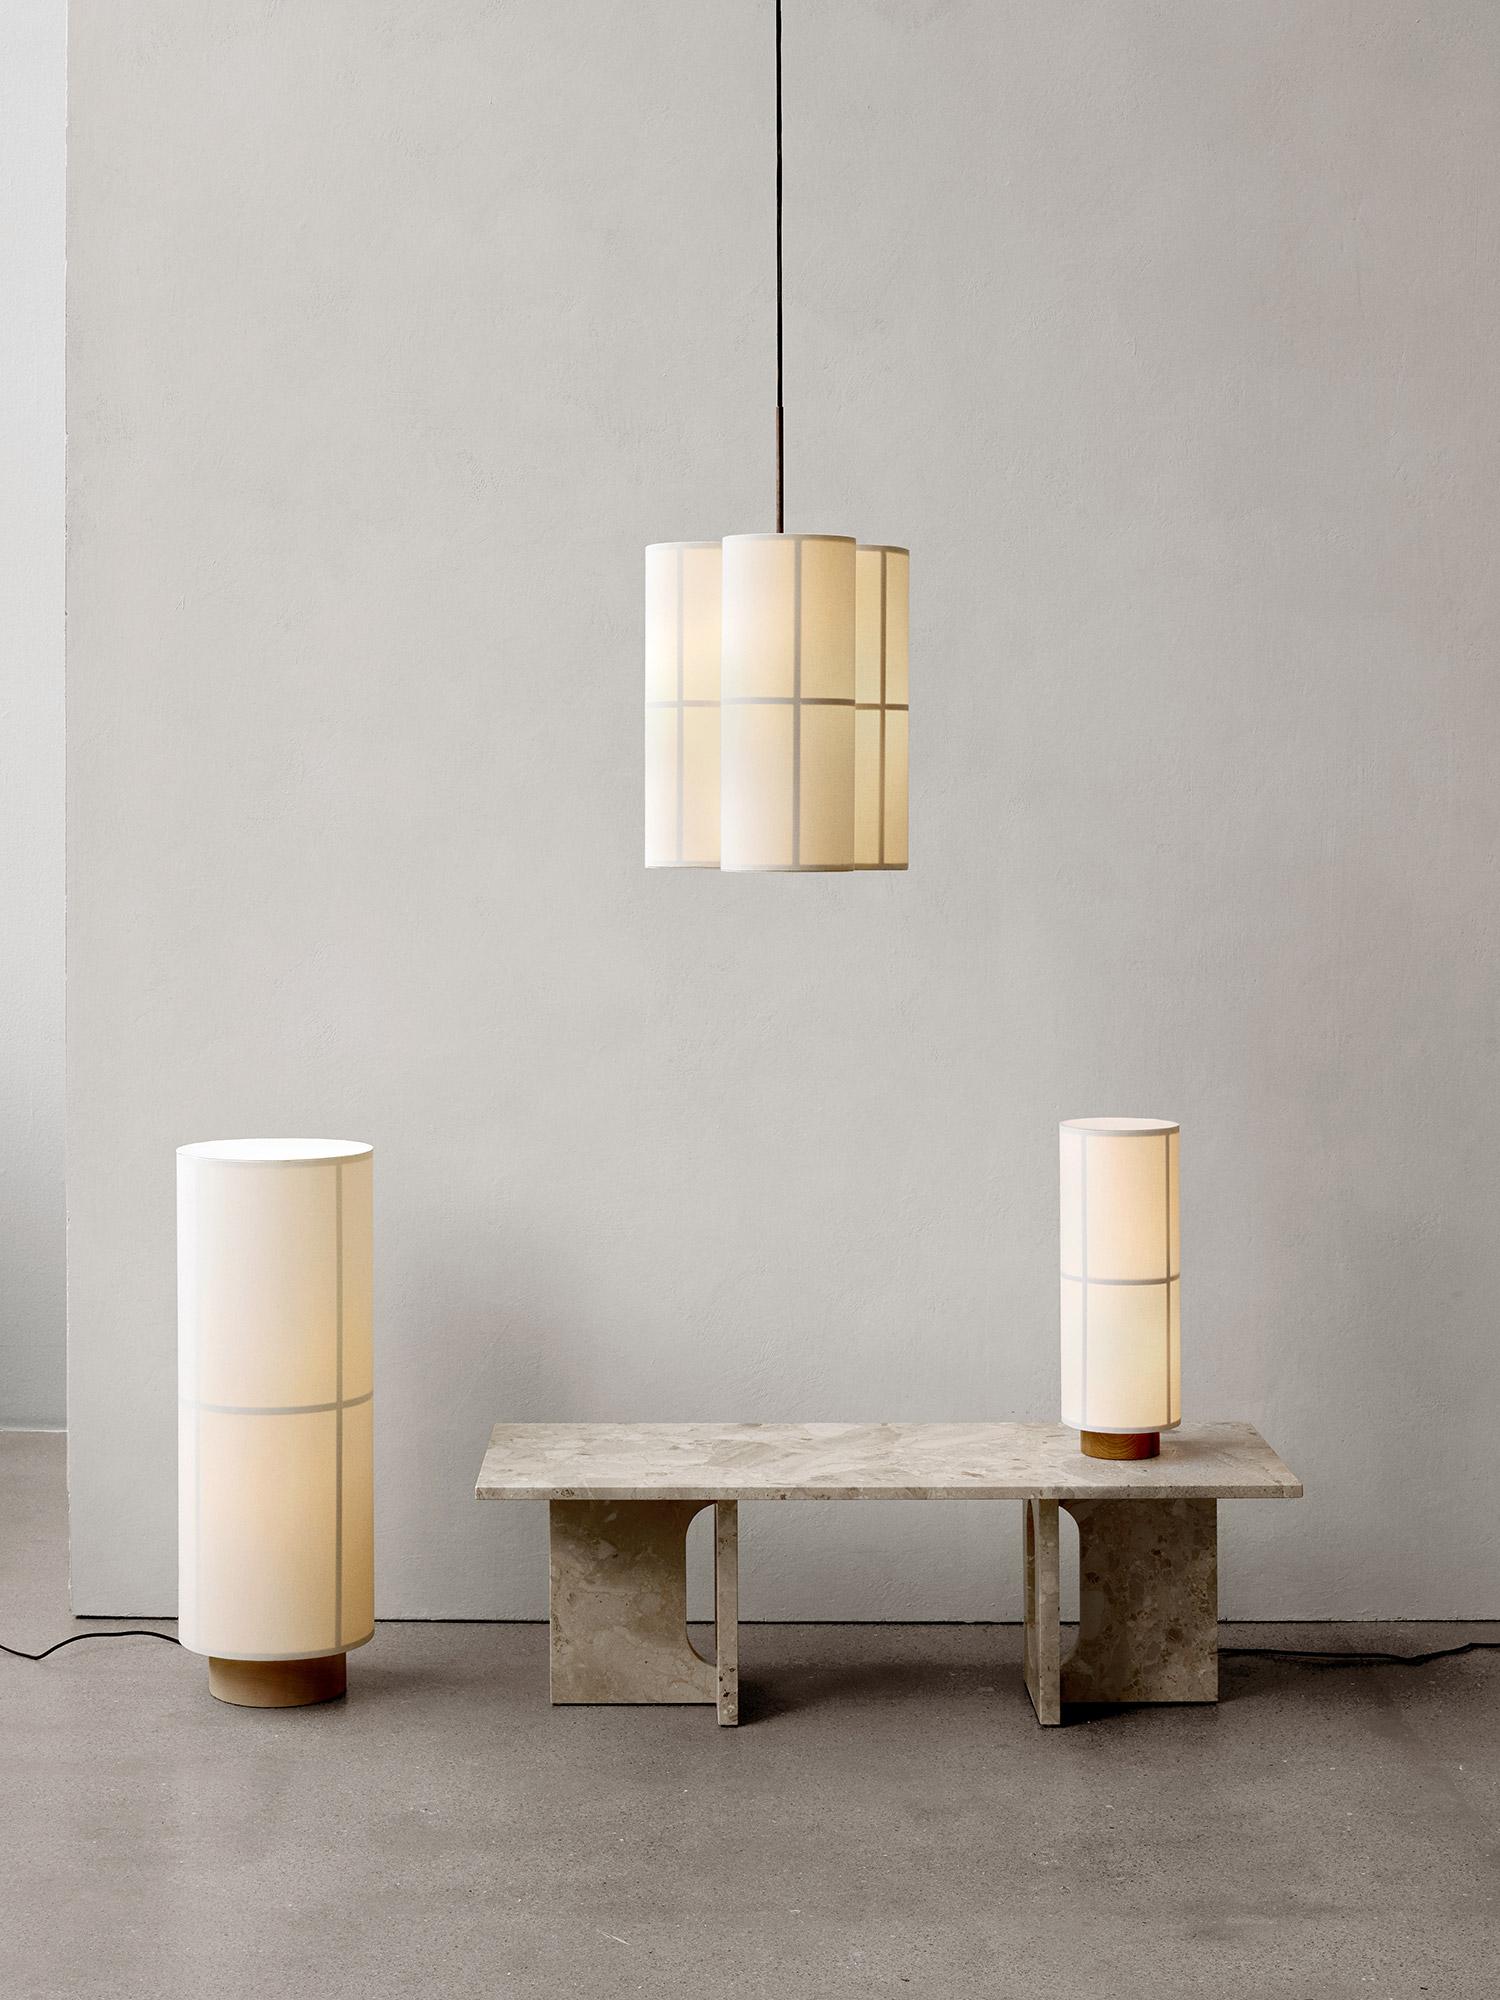 Hashira lighting collection, marble table, grey wall